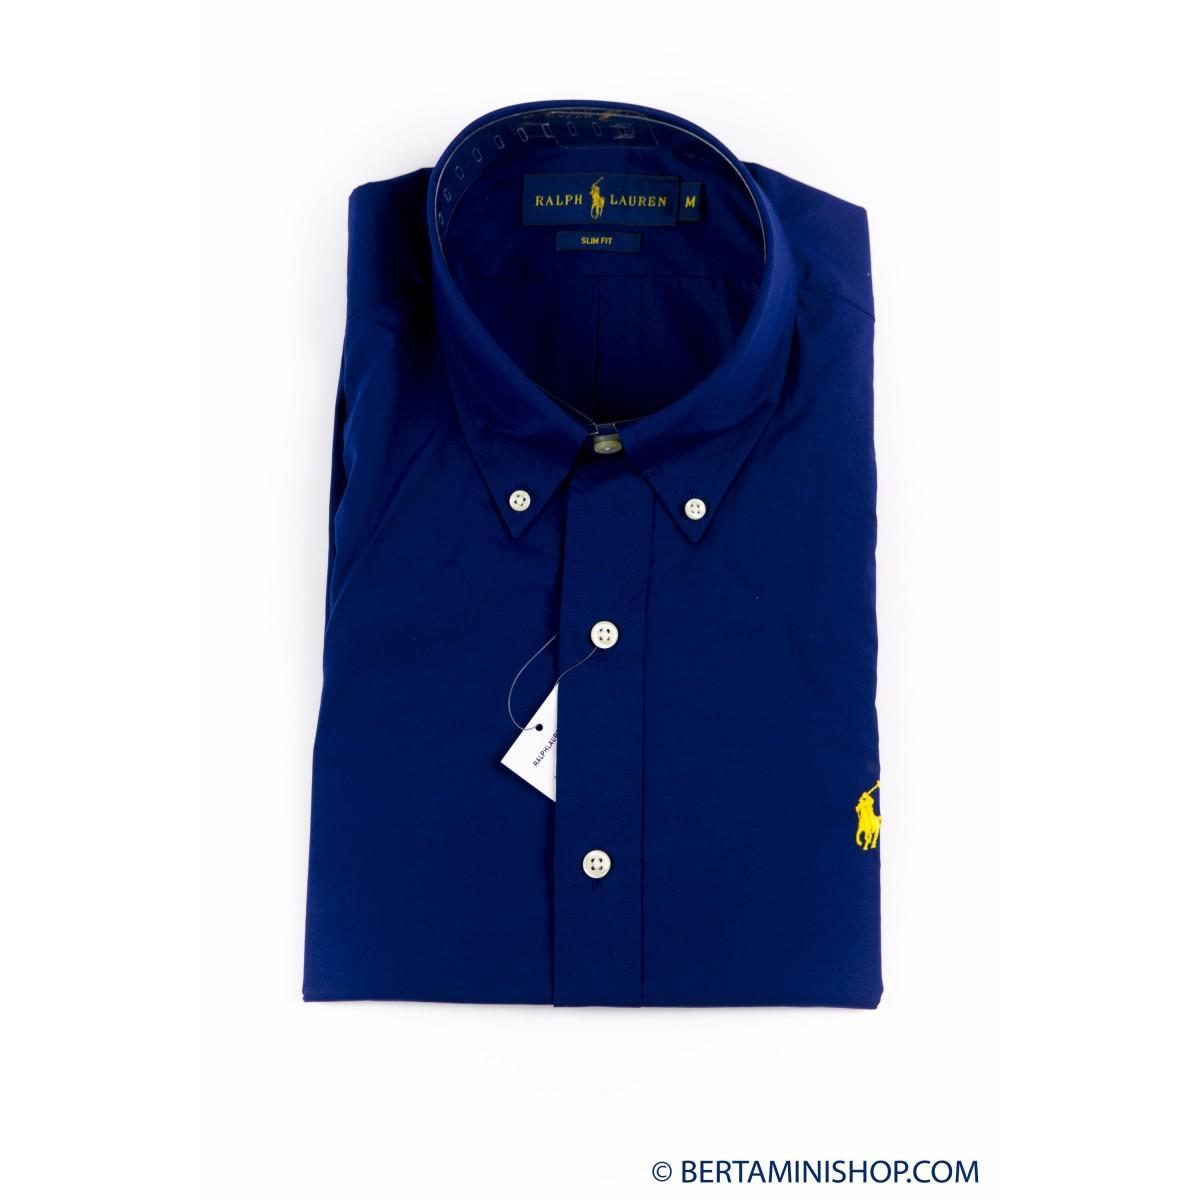 Camicia uomo Ralph lauren - A04wersmc0109 popeline slim B4919 - blu